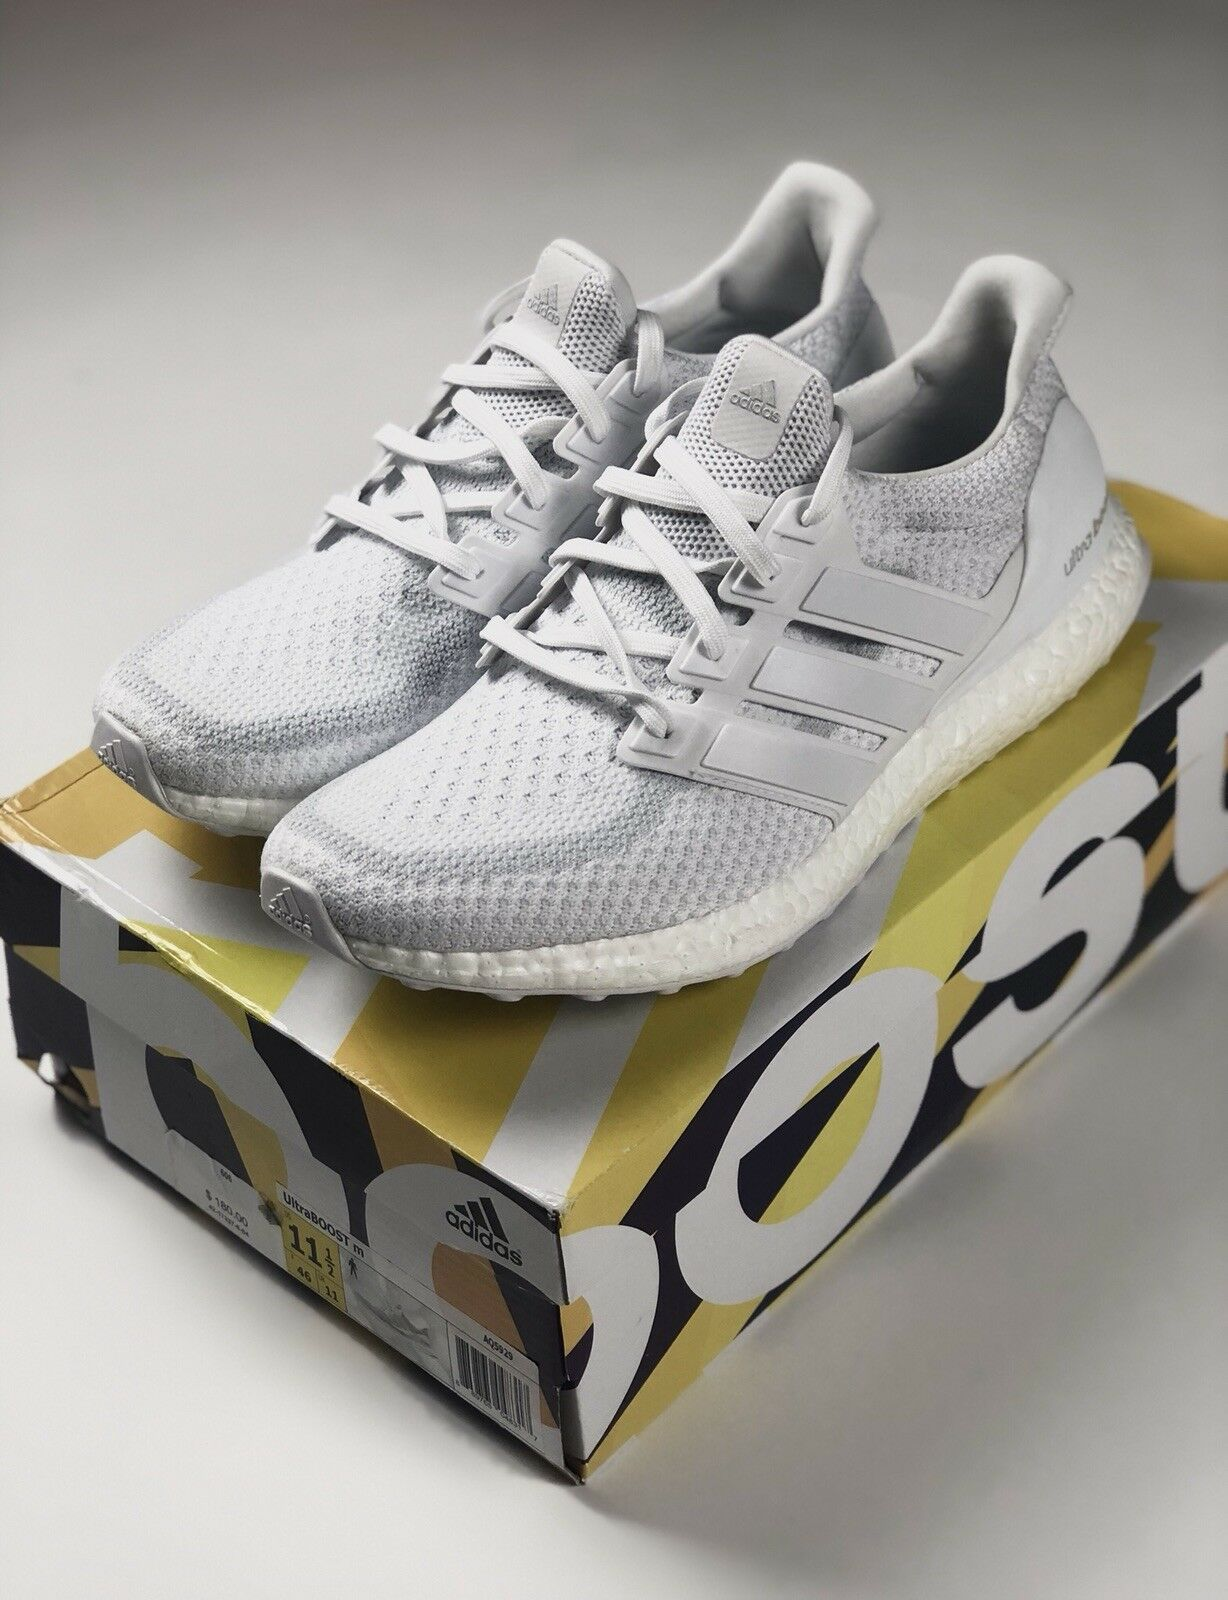 11 UK 2.0 Boost Ultra Adidas nos blancooo Ds Nuevo 11.5